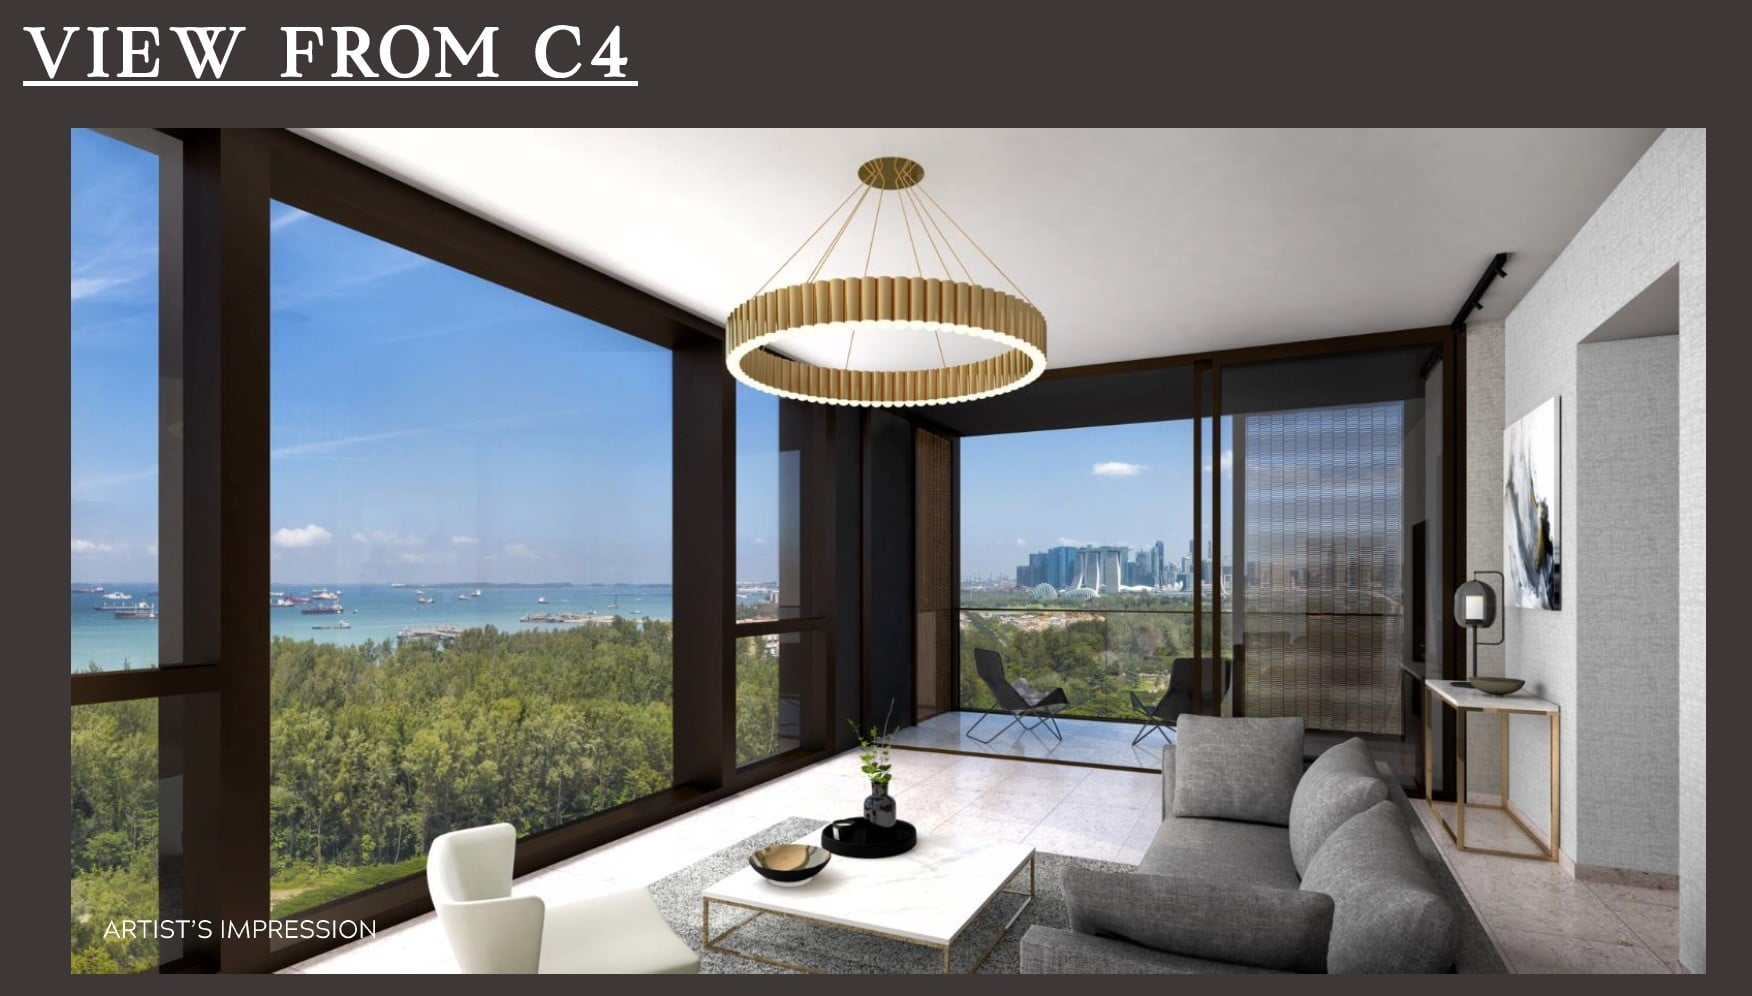 Meyer-Mansion-View fr C4